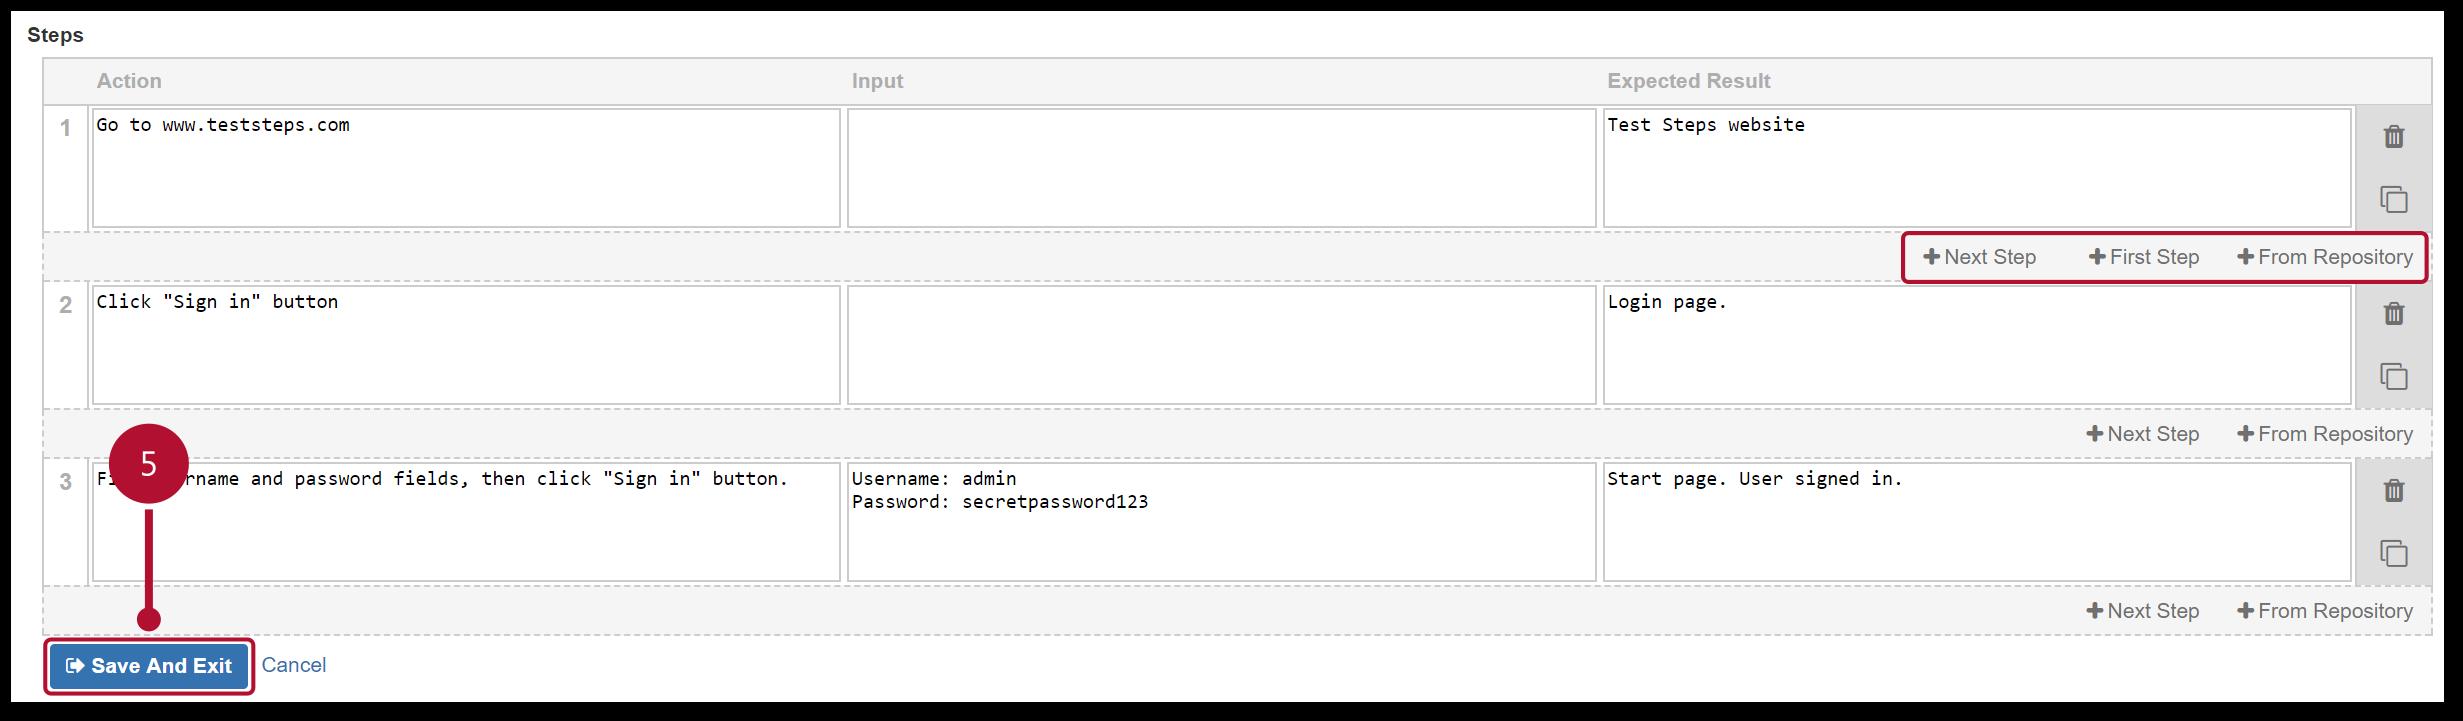 TestFLO Cloud: Adding more Steps